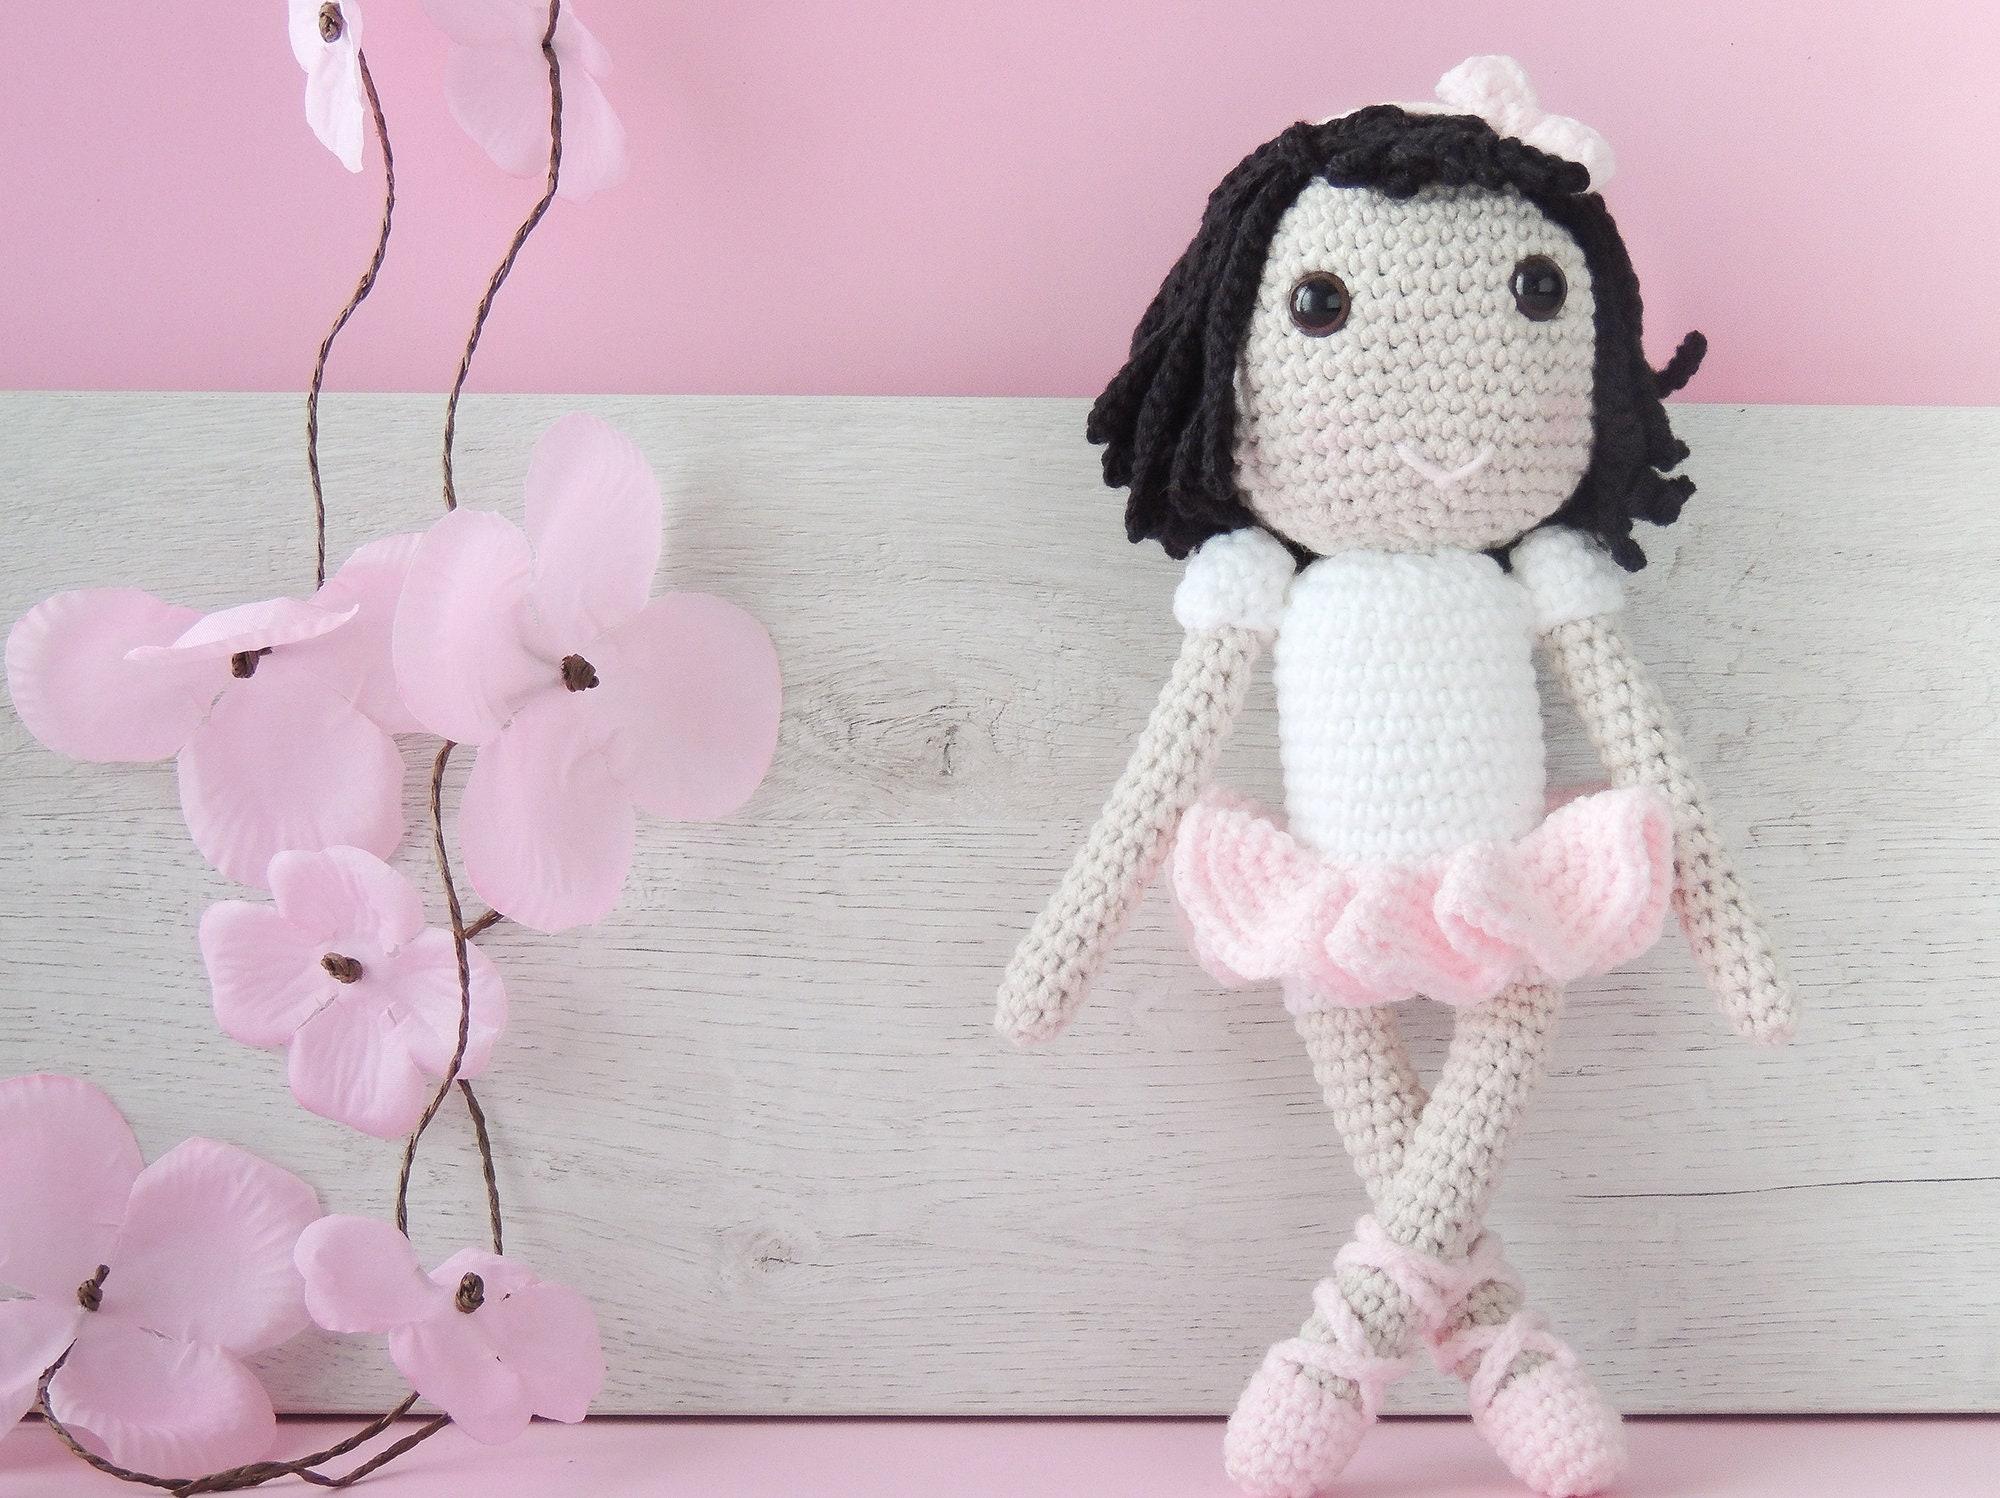 Muñeca bailarina muñeca amigurumi muñeca crochet muñeca de | Etsy